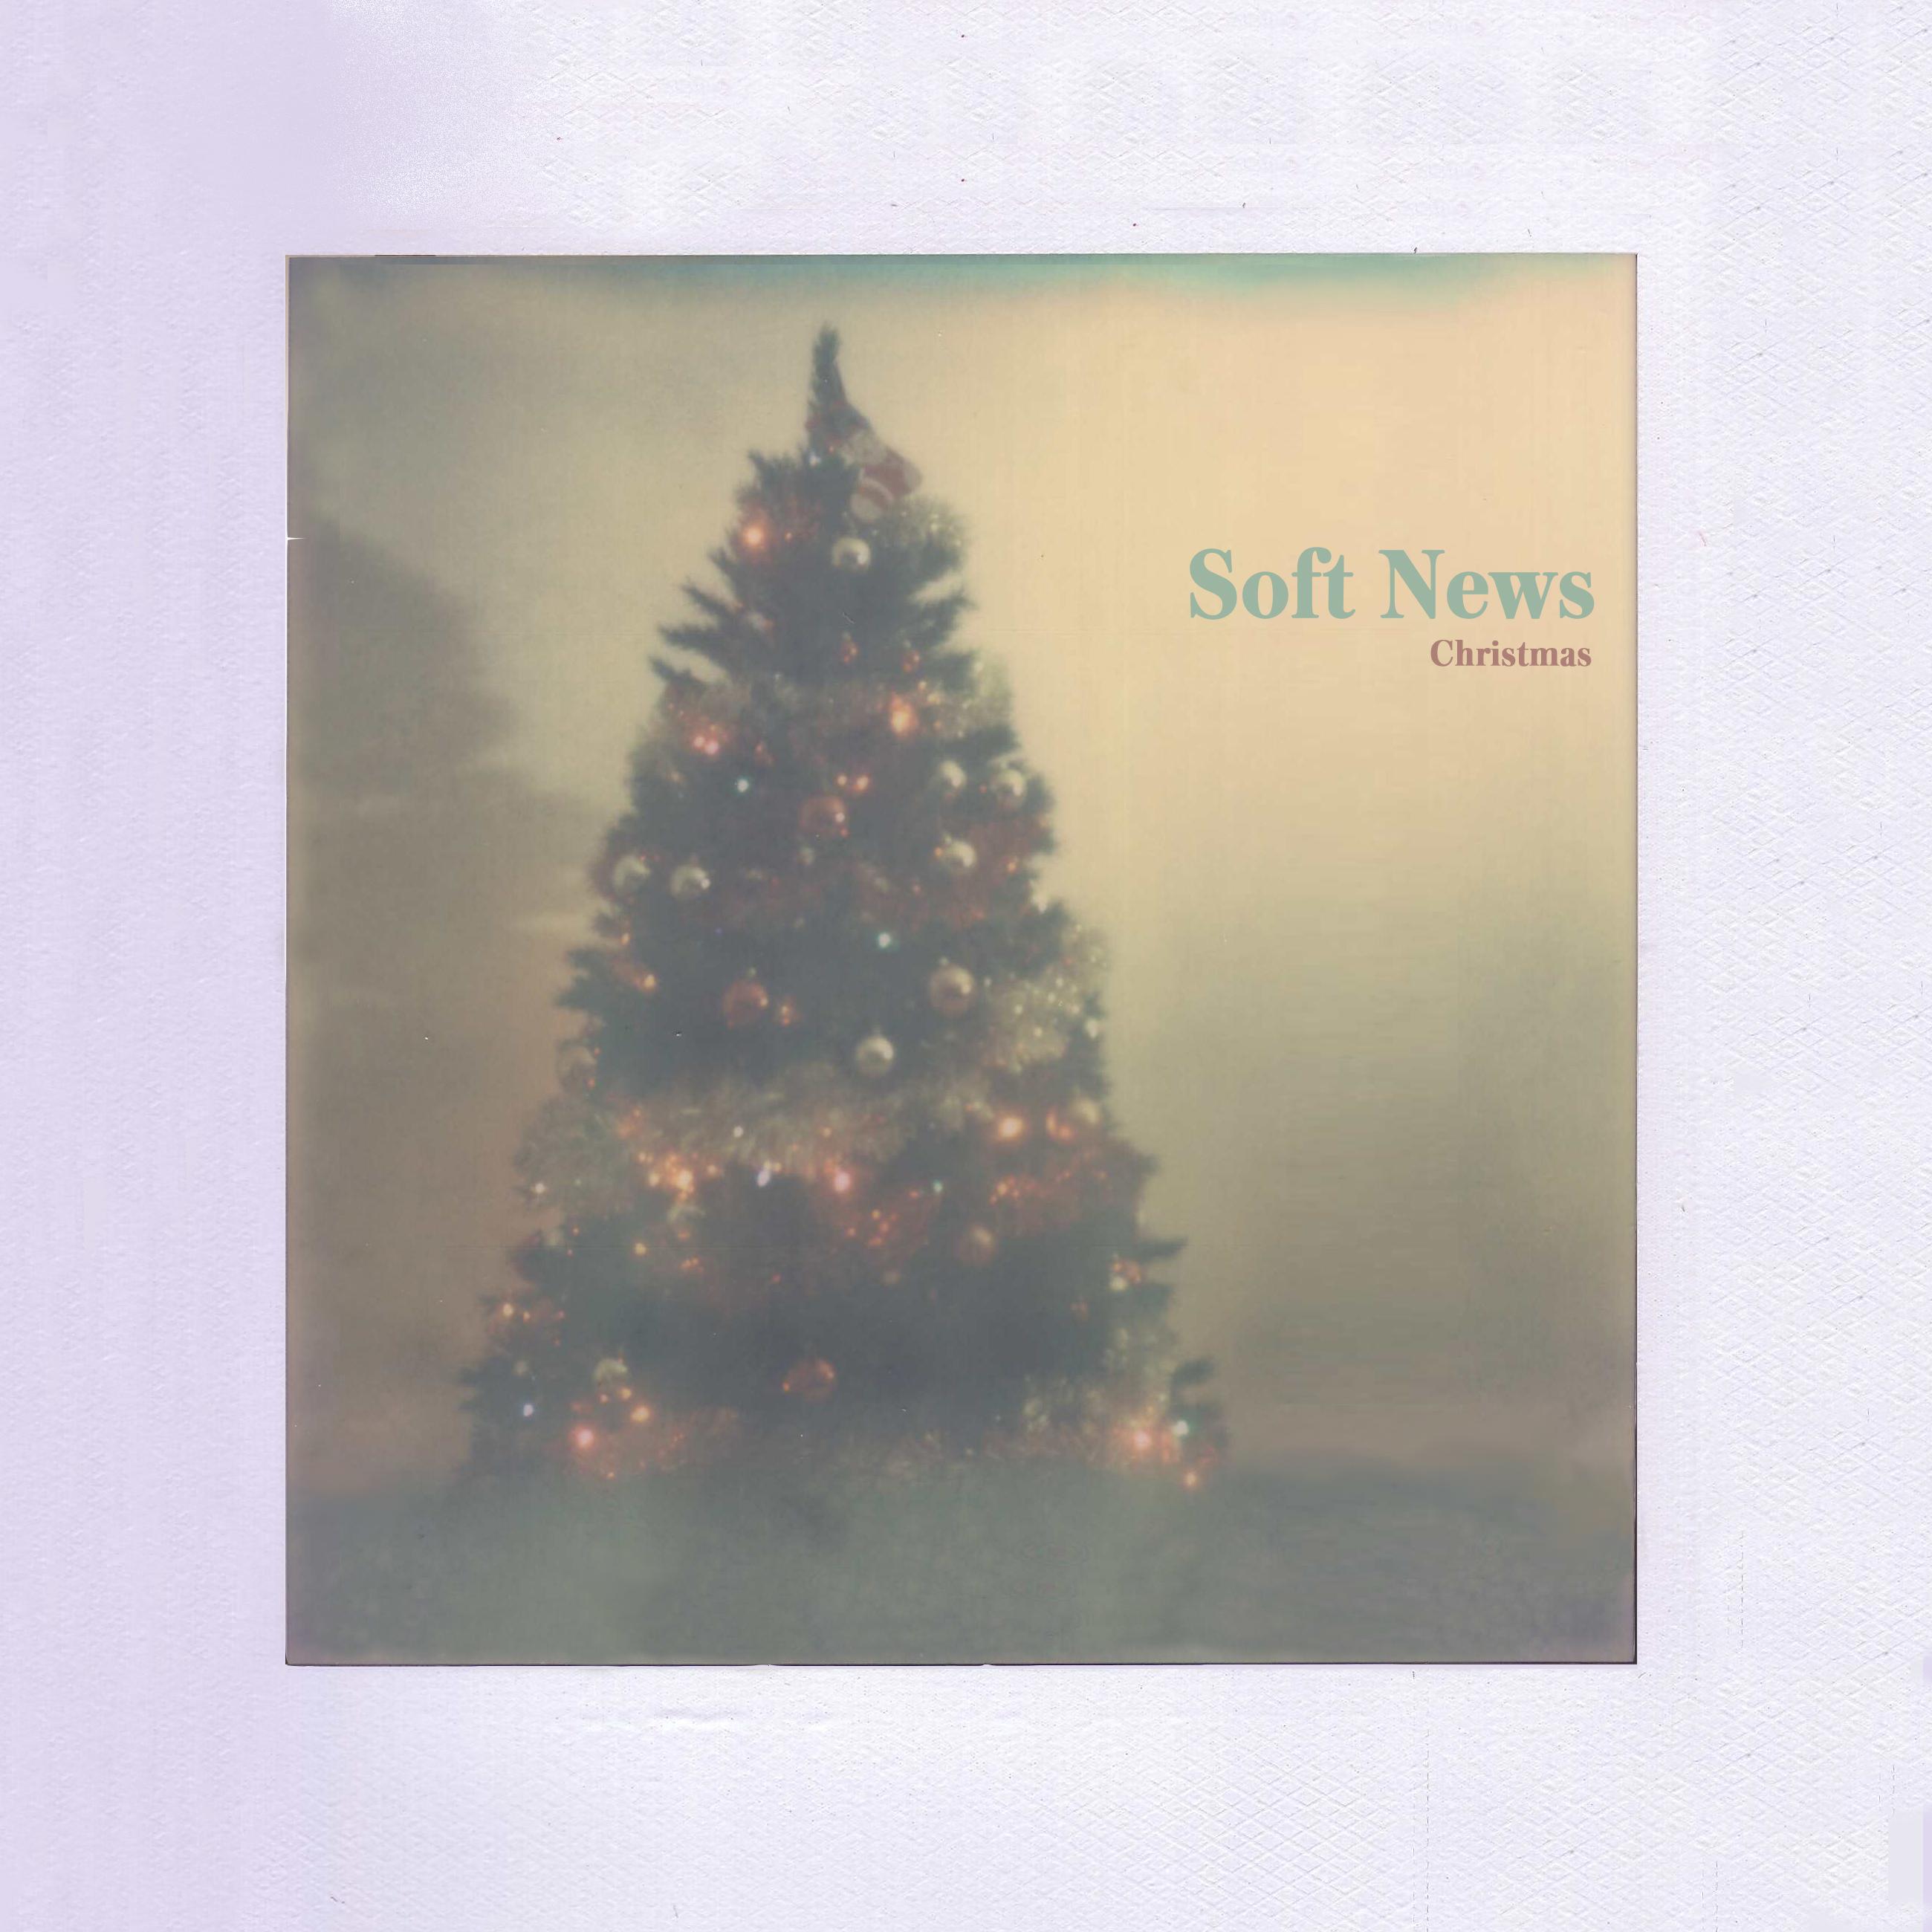 Free Christmas Radio.Listen Free To Soft News White Christmas Radio Iheartradio